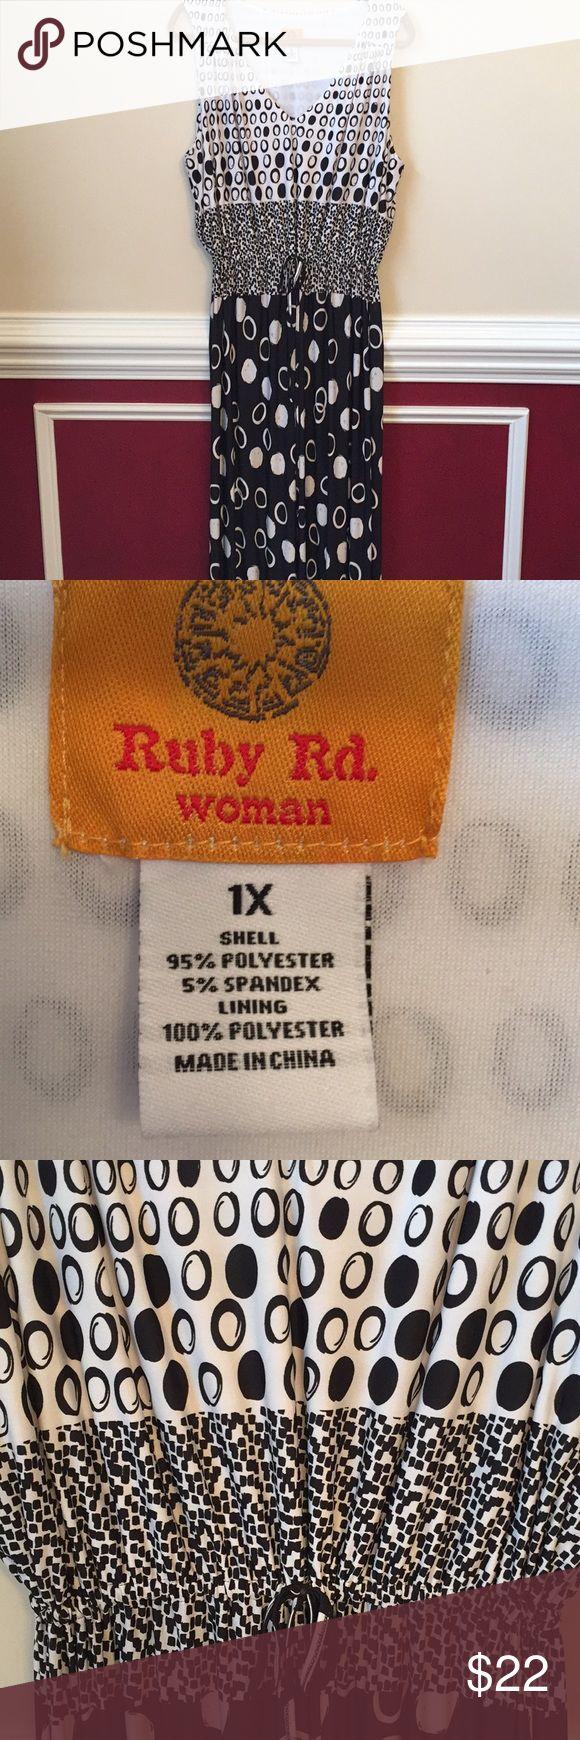 Ruby Rd polka dot maxi dress sz 1X Very good condition. Adjustable tie waist. Dresses Maxi